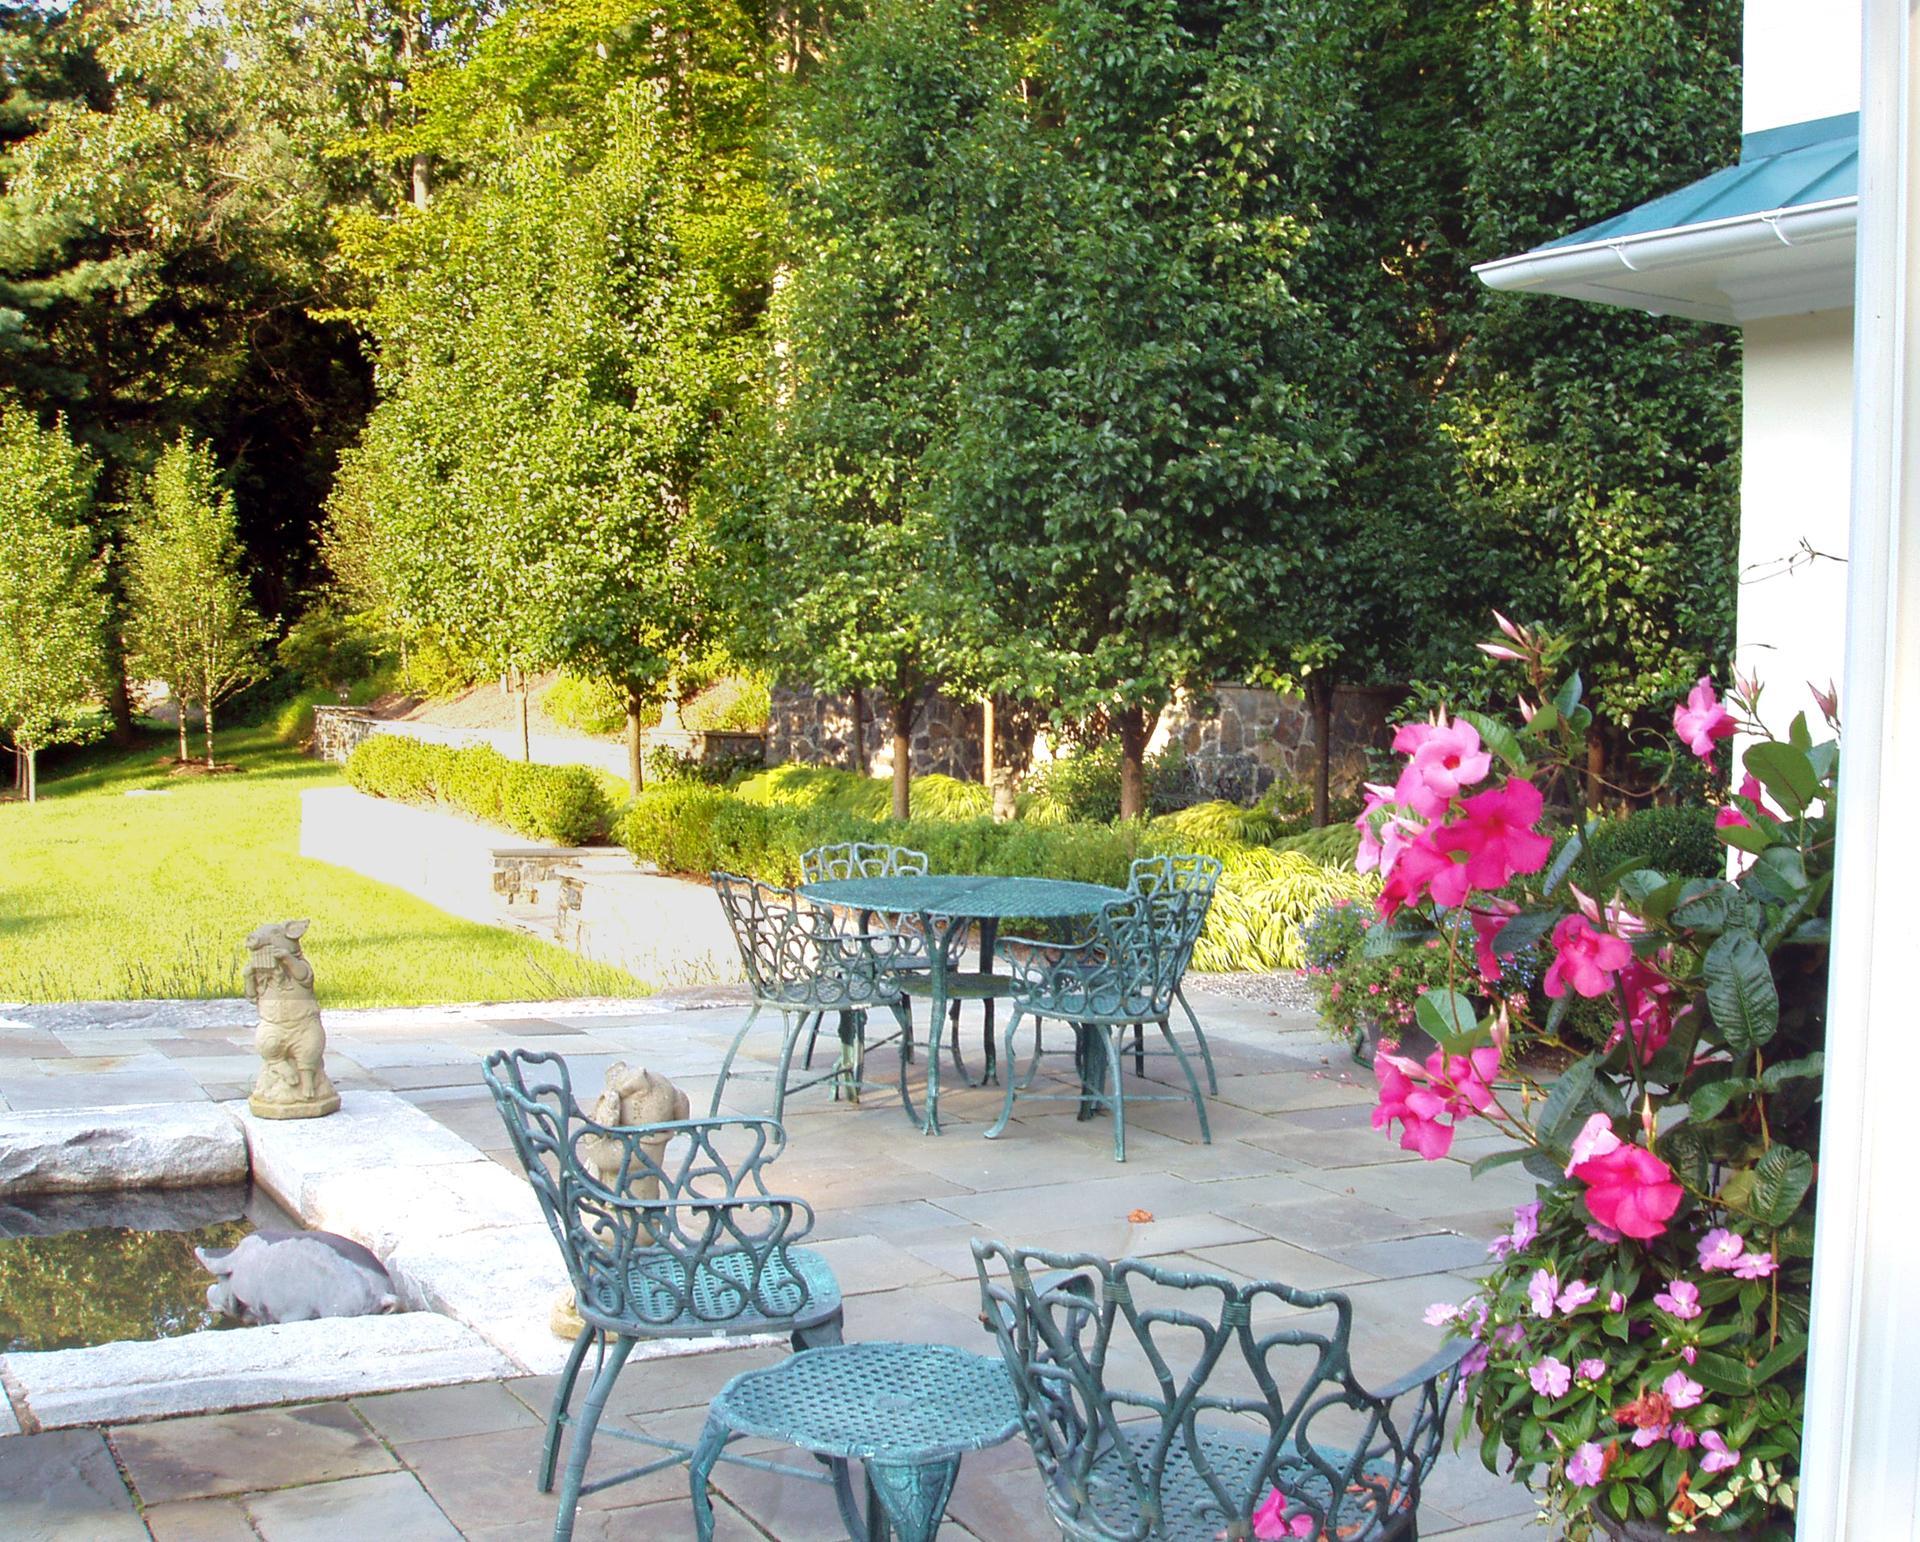 stone-patio-garden-design-west-chester-pa